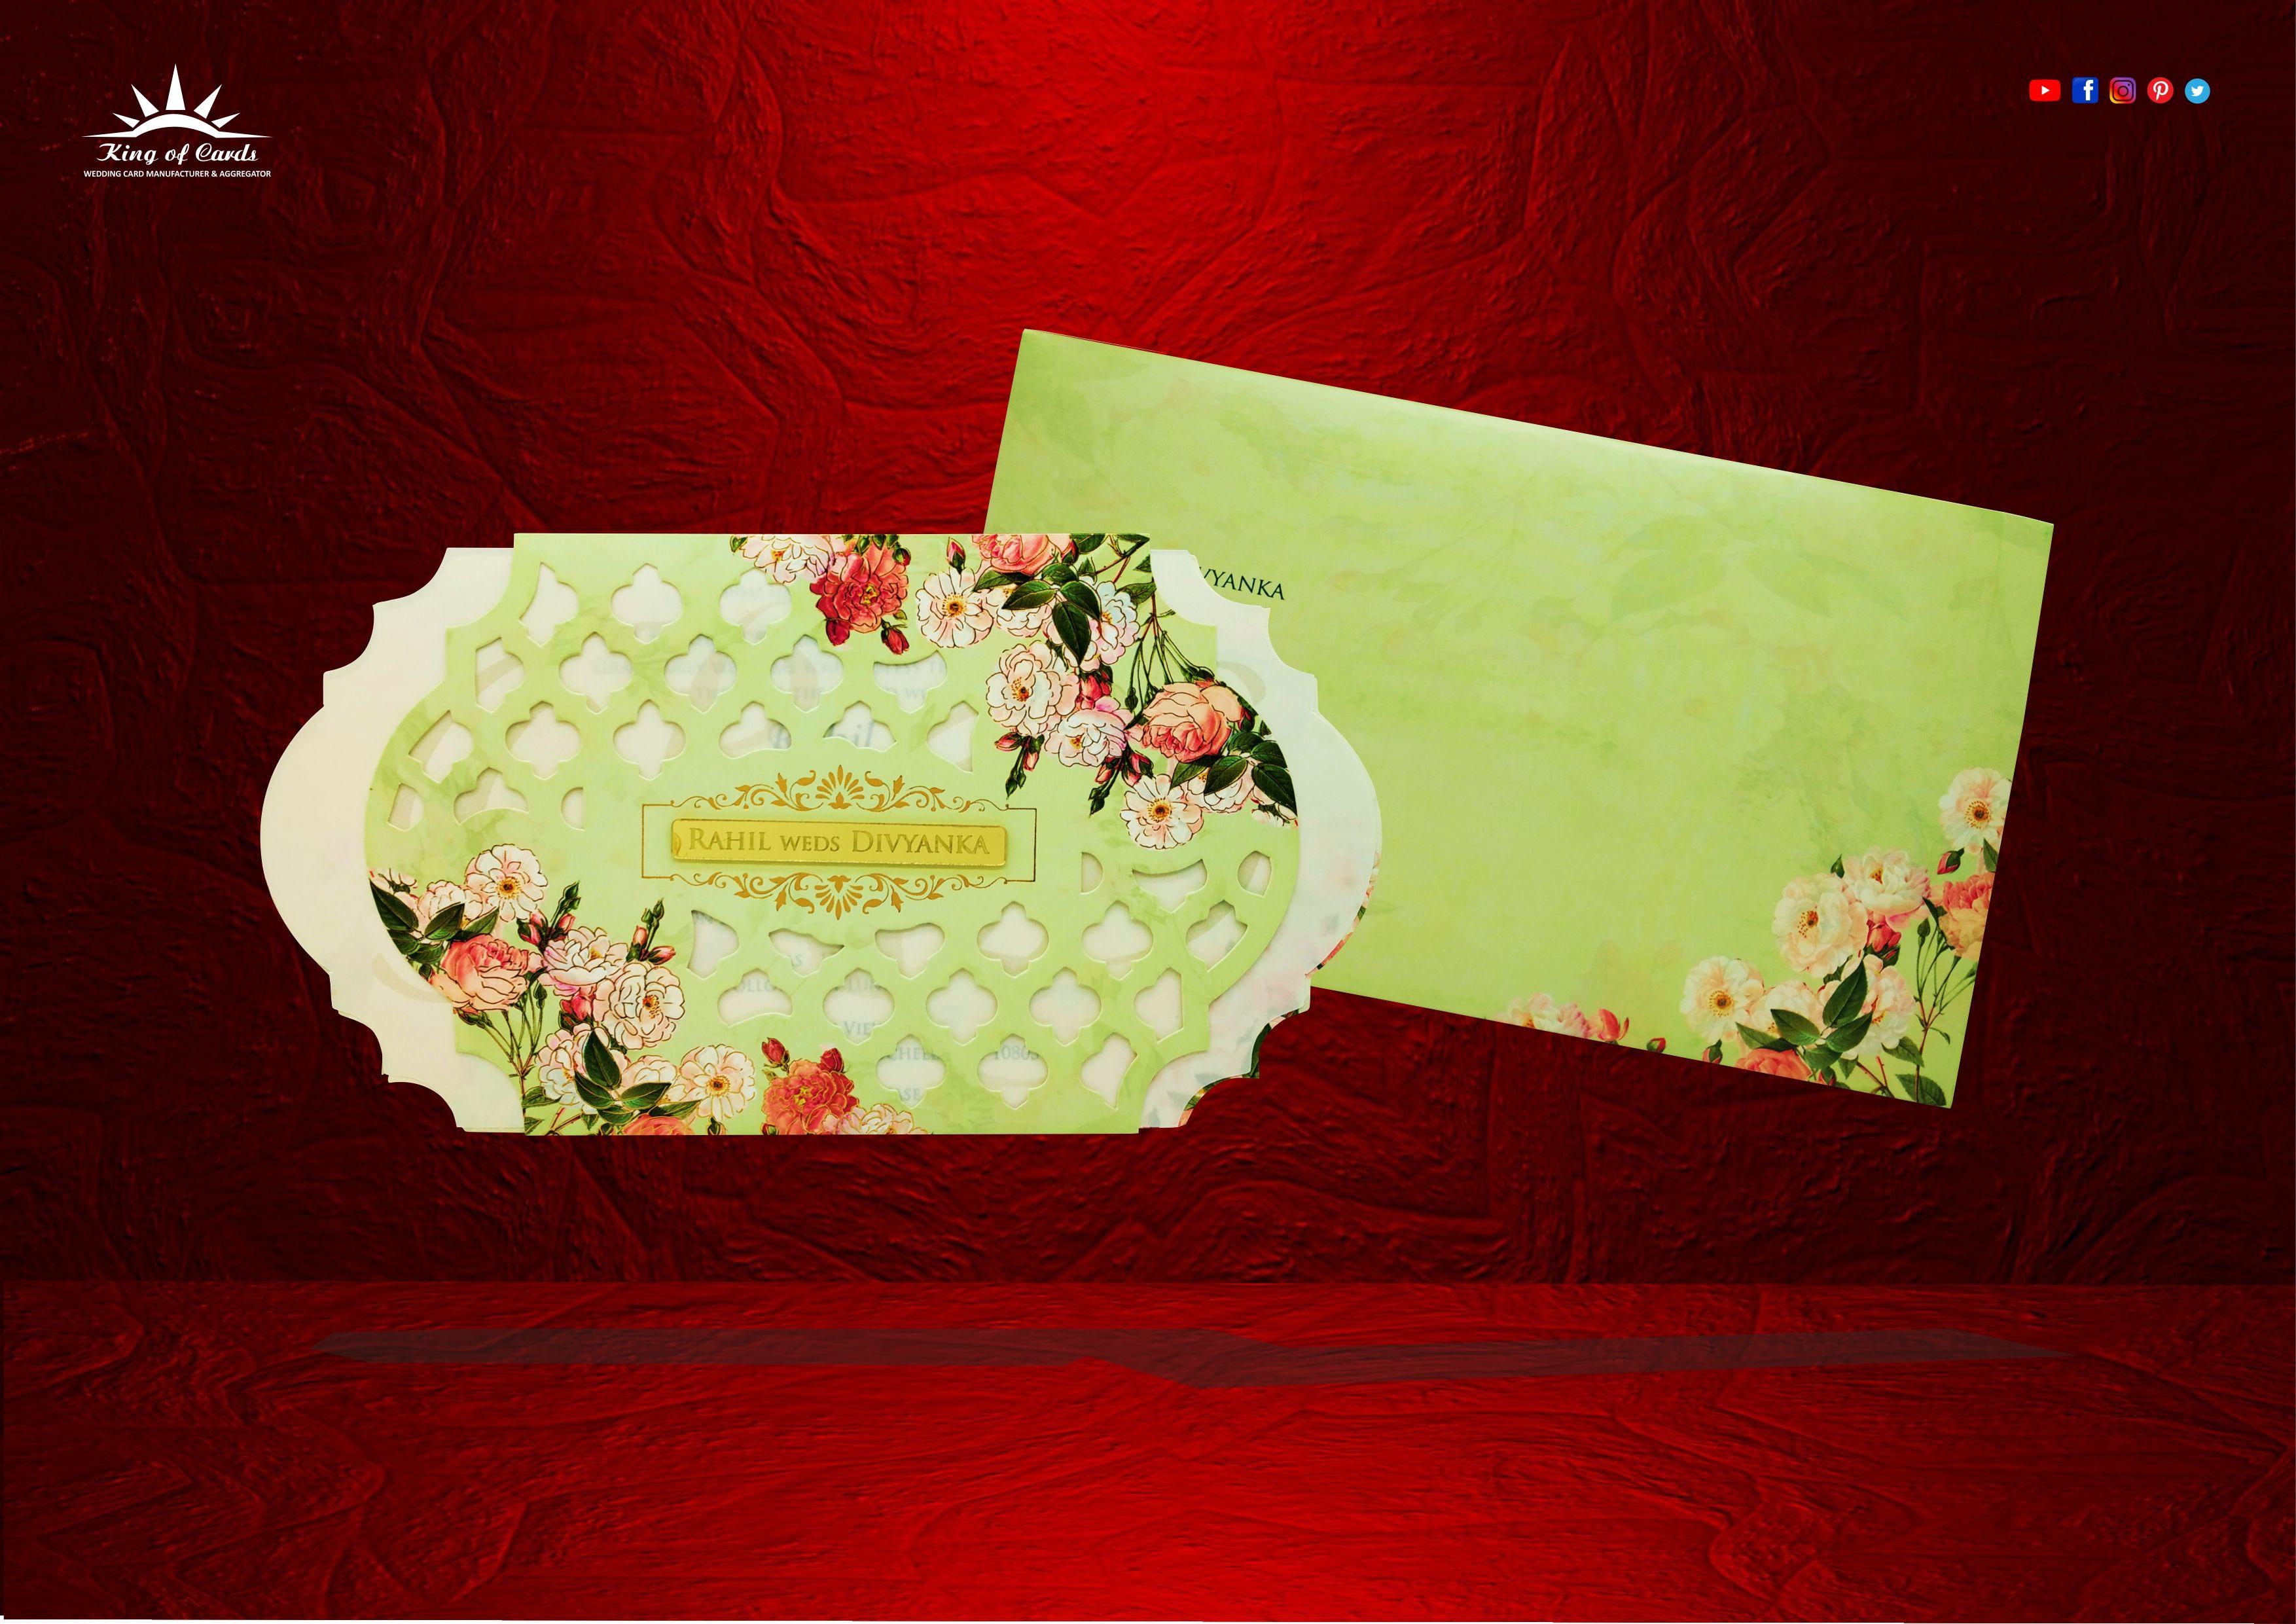 Call @ 08040912931 Or Whatsapp @ 08073526747 #weddingcard #weddinginvitation #invitation #weddinginvitation #wedding #invitations #invitationdesign #invitationcard #invitationdesigner #kingofcards